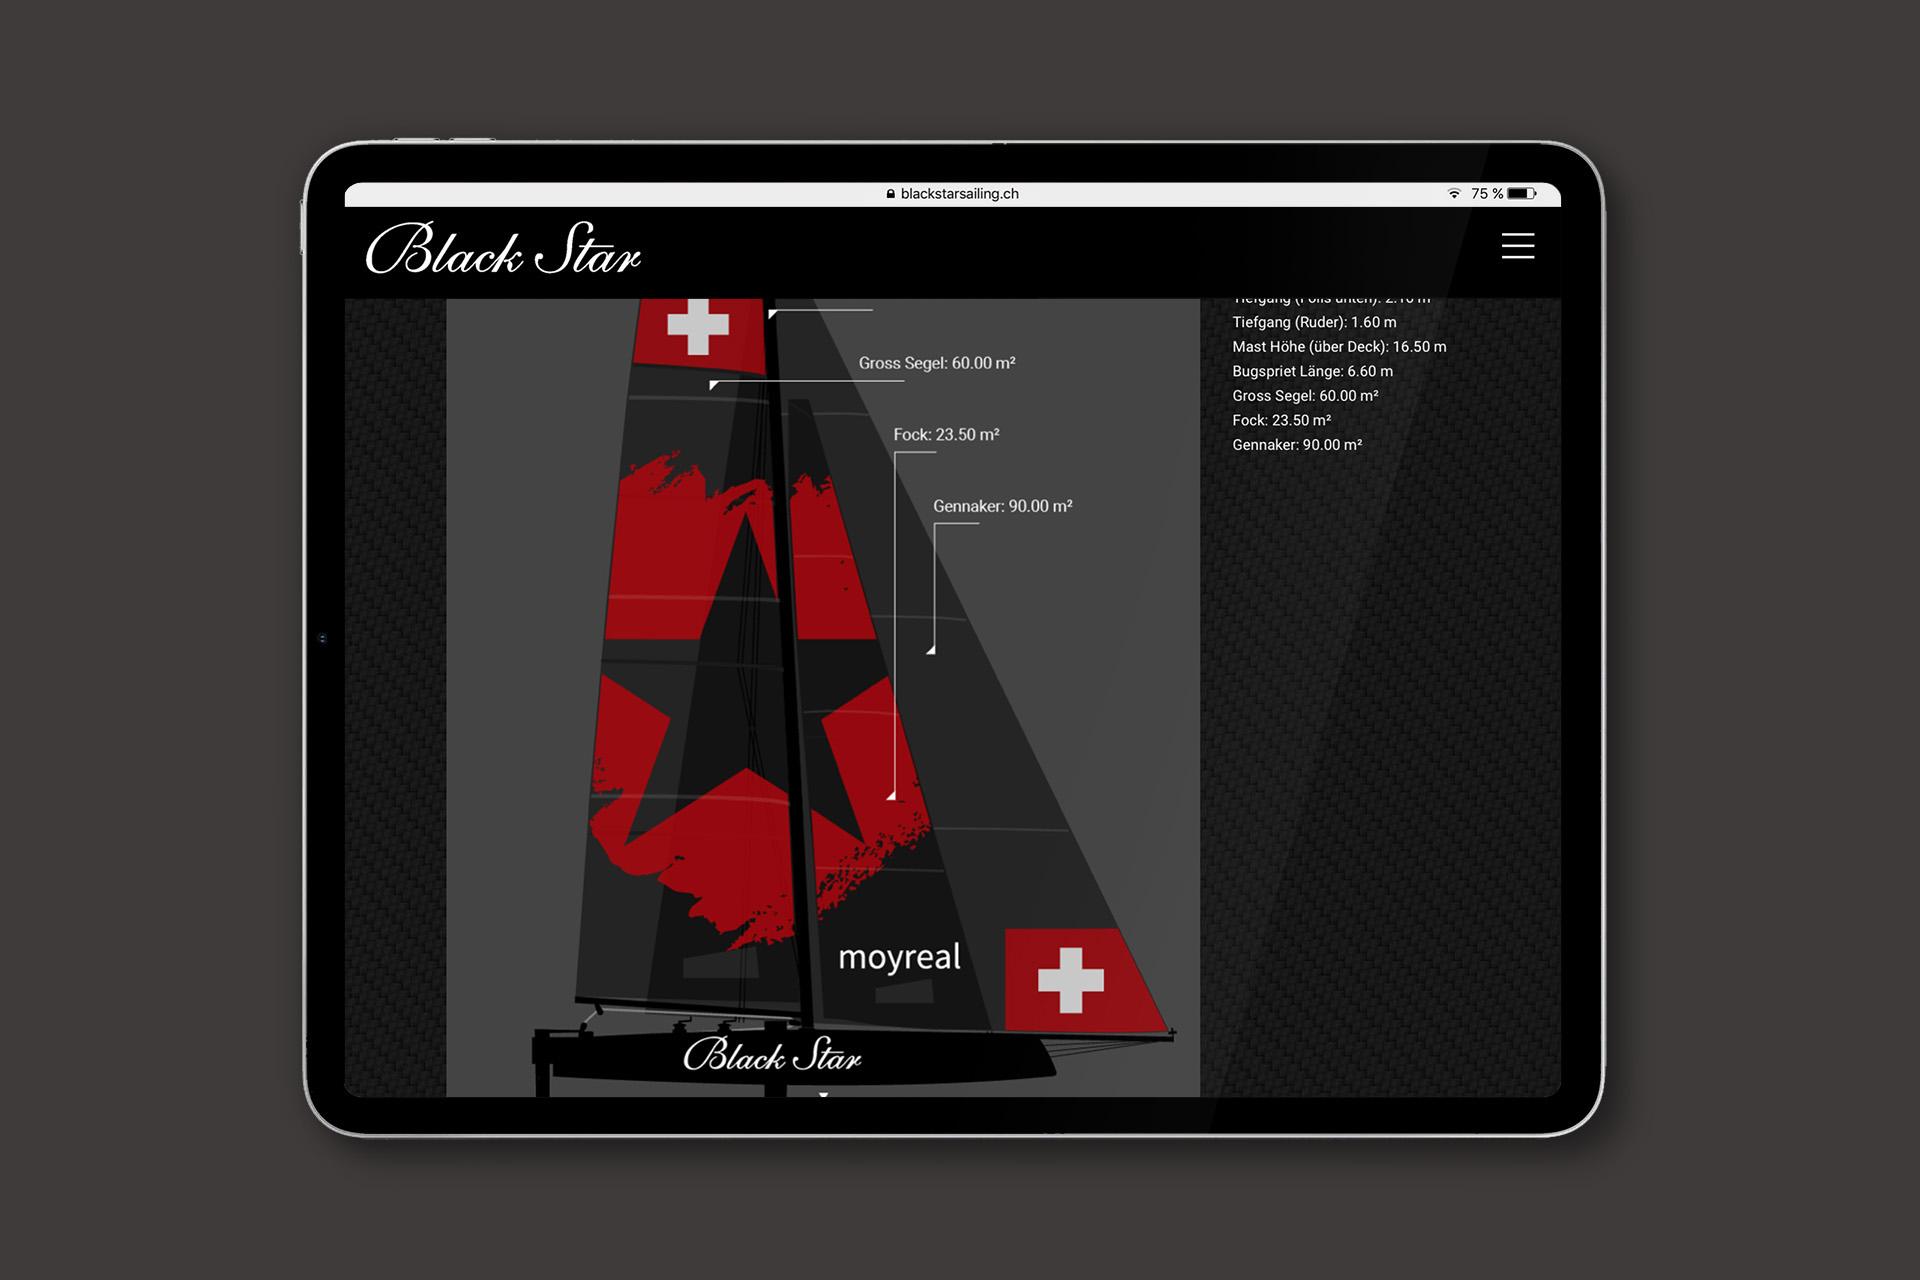 BlackStarSailing_iPad_16